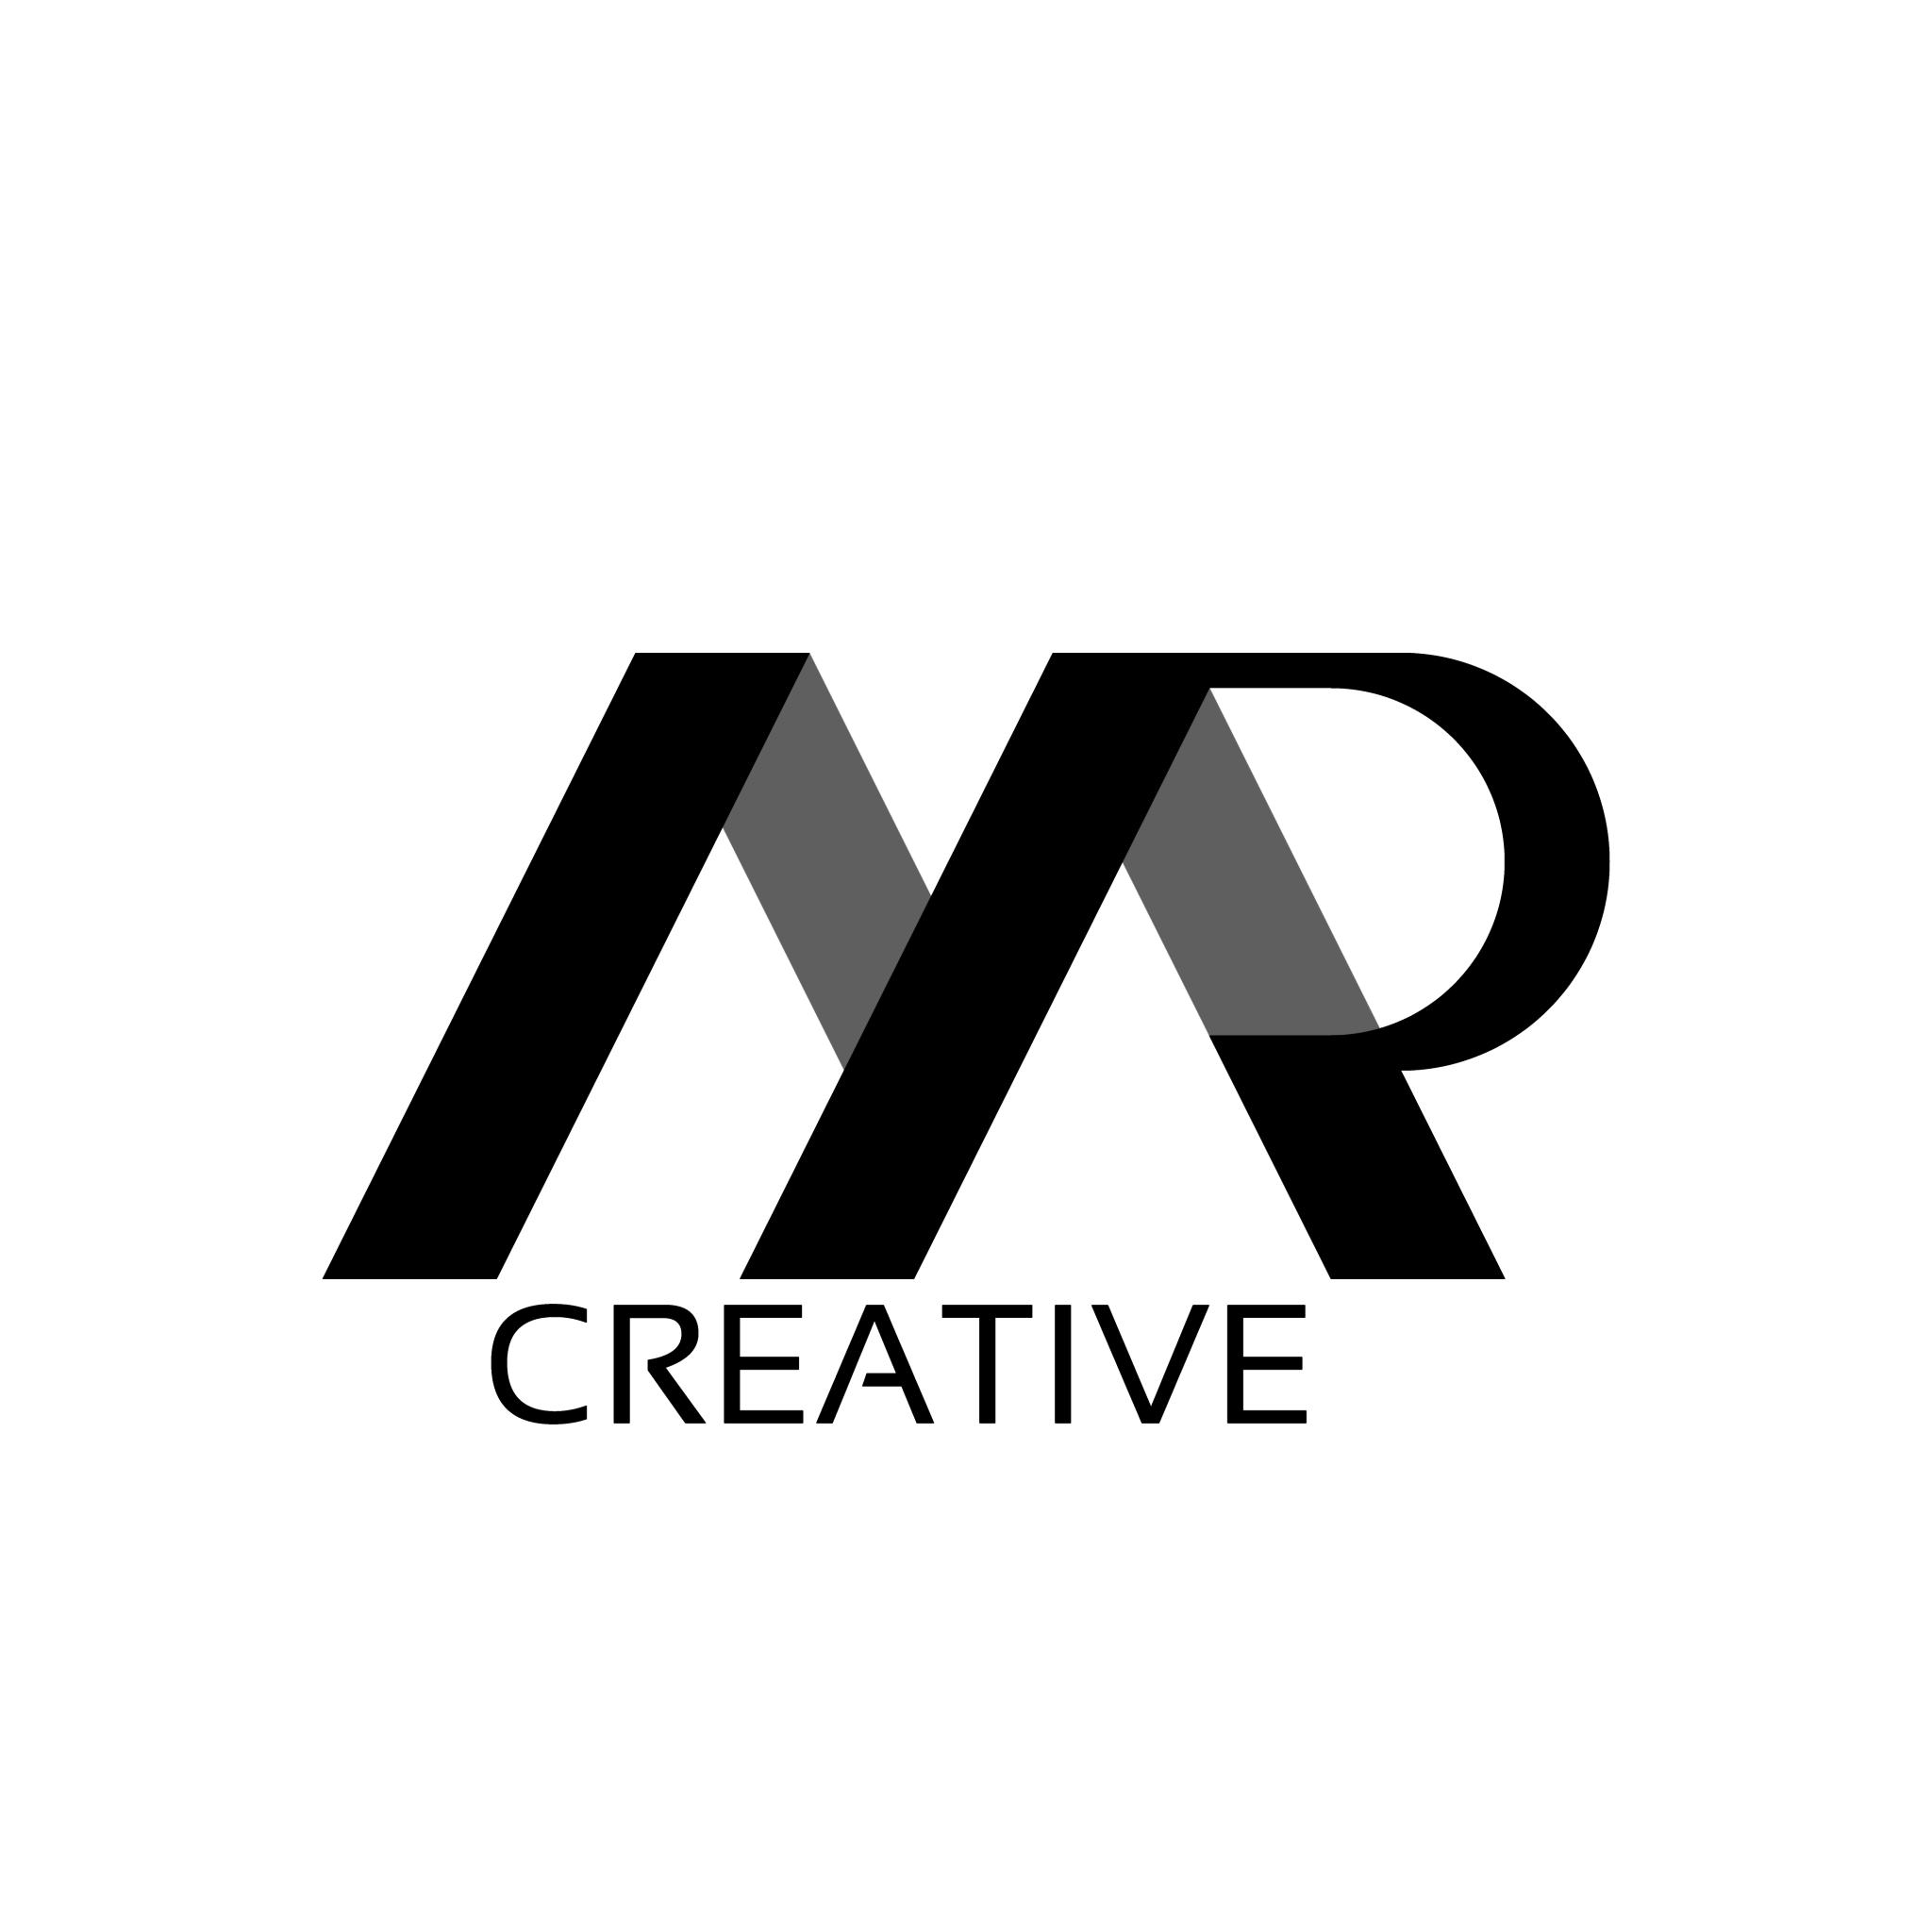 mvr-creative